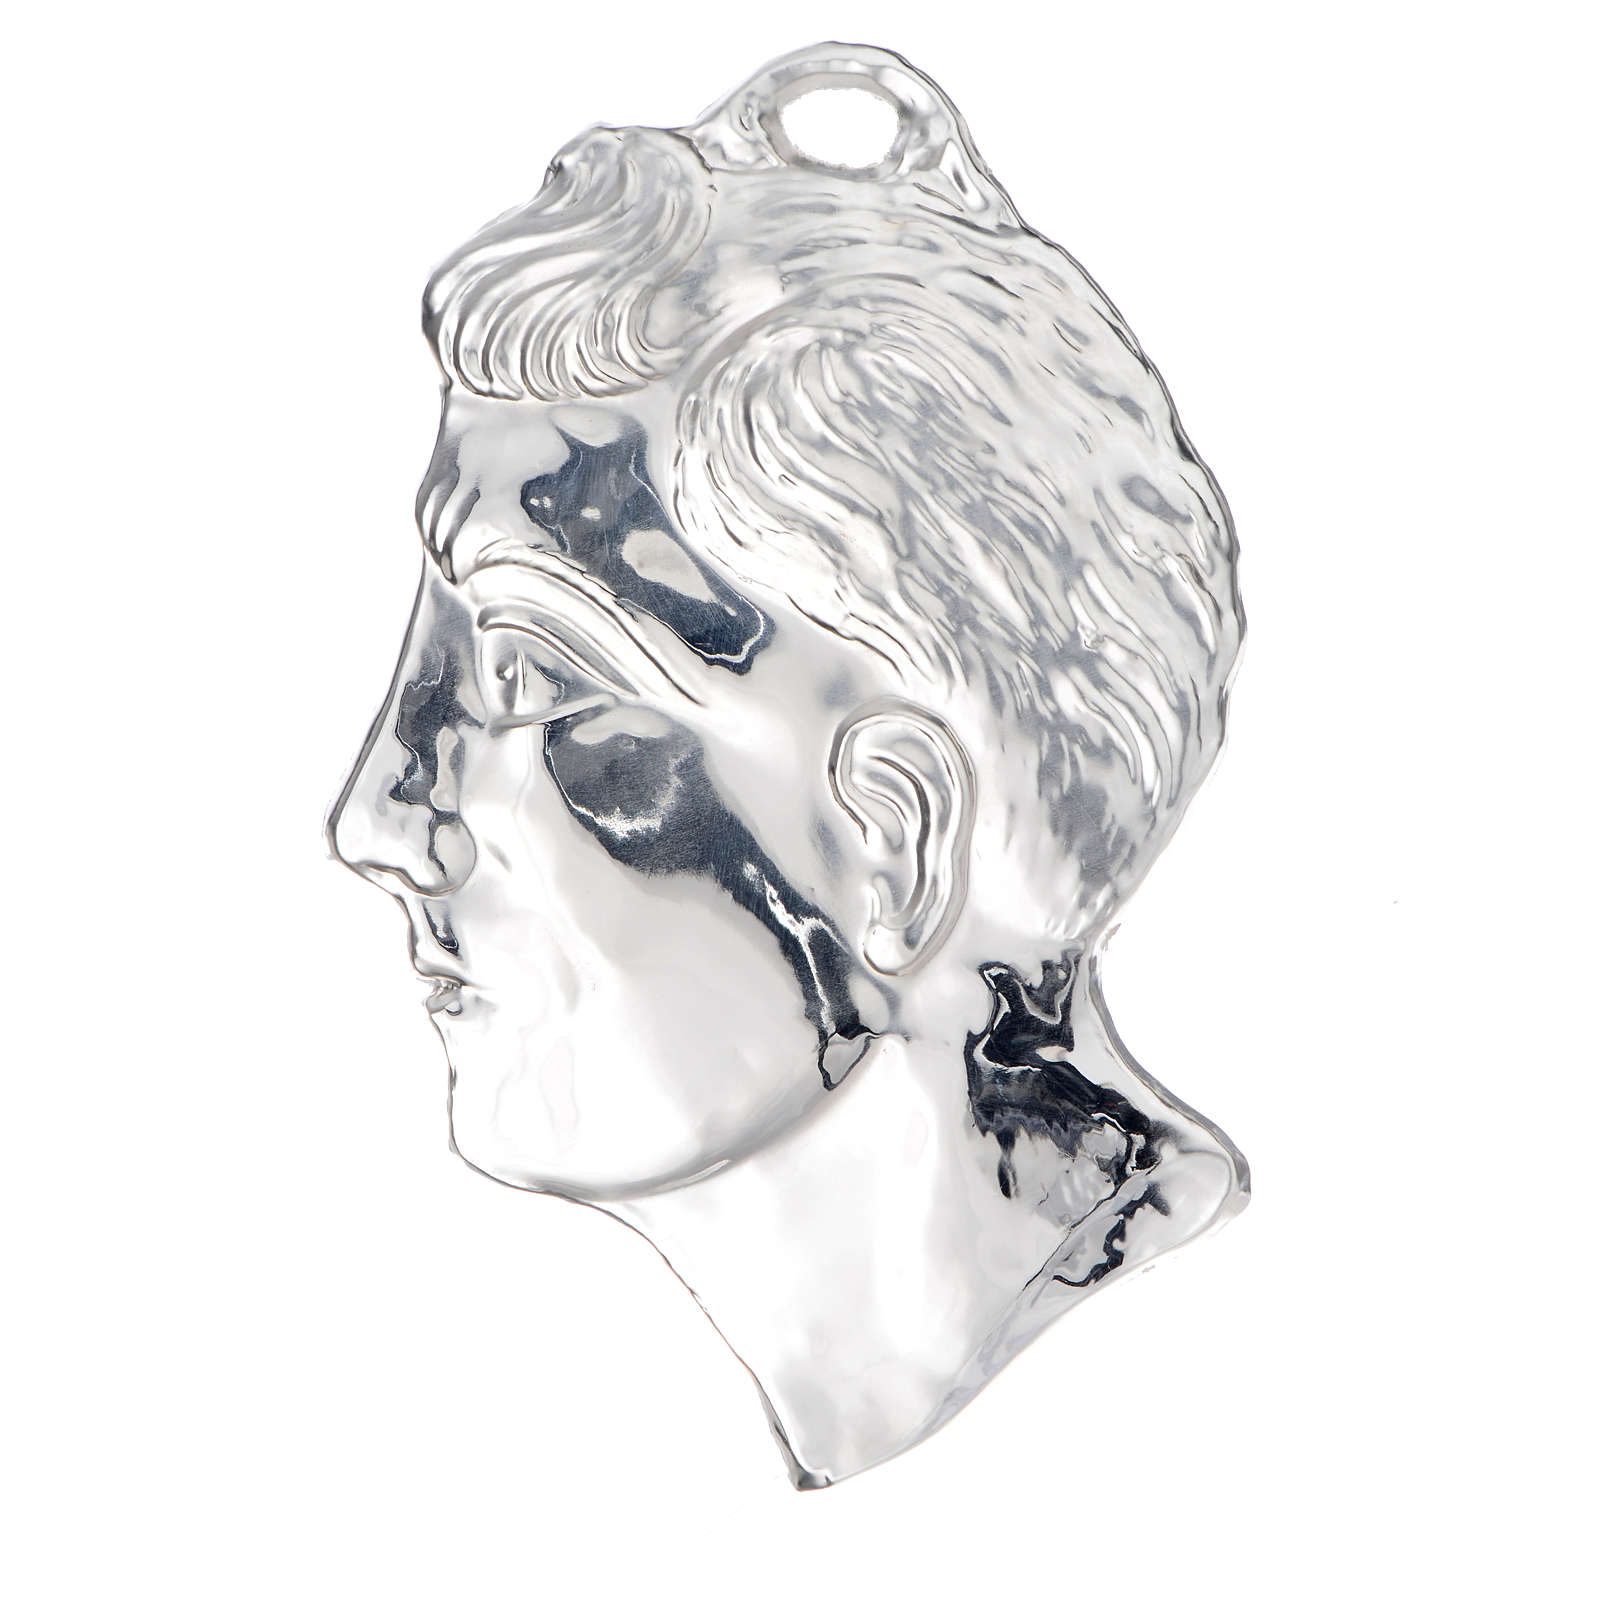 Ex-voto, man head in sterling silver or metal, 13cm 3